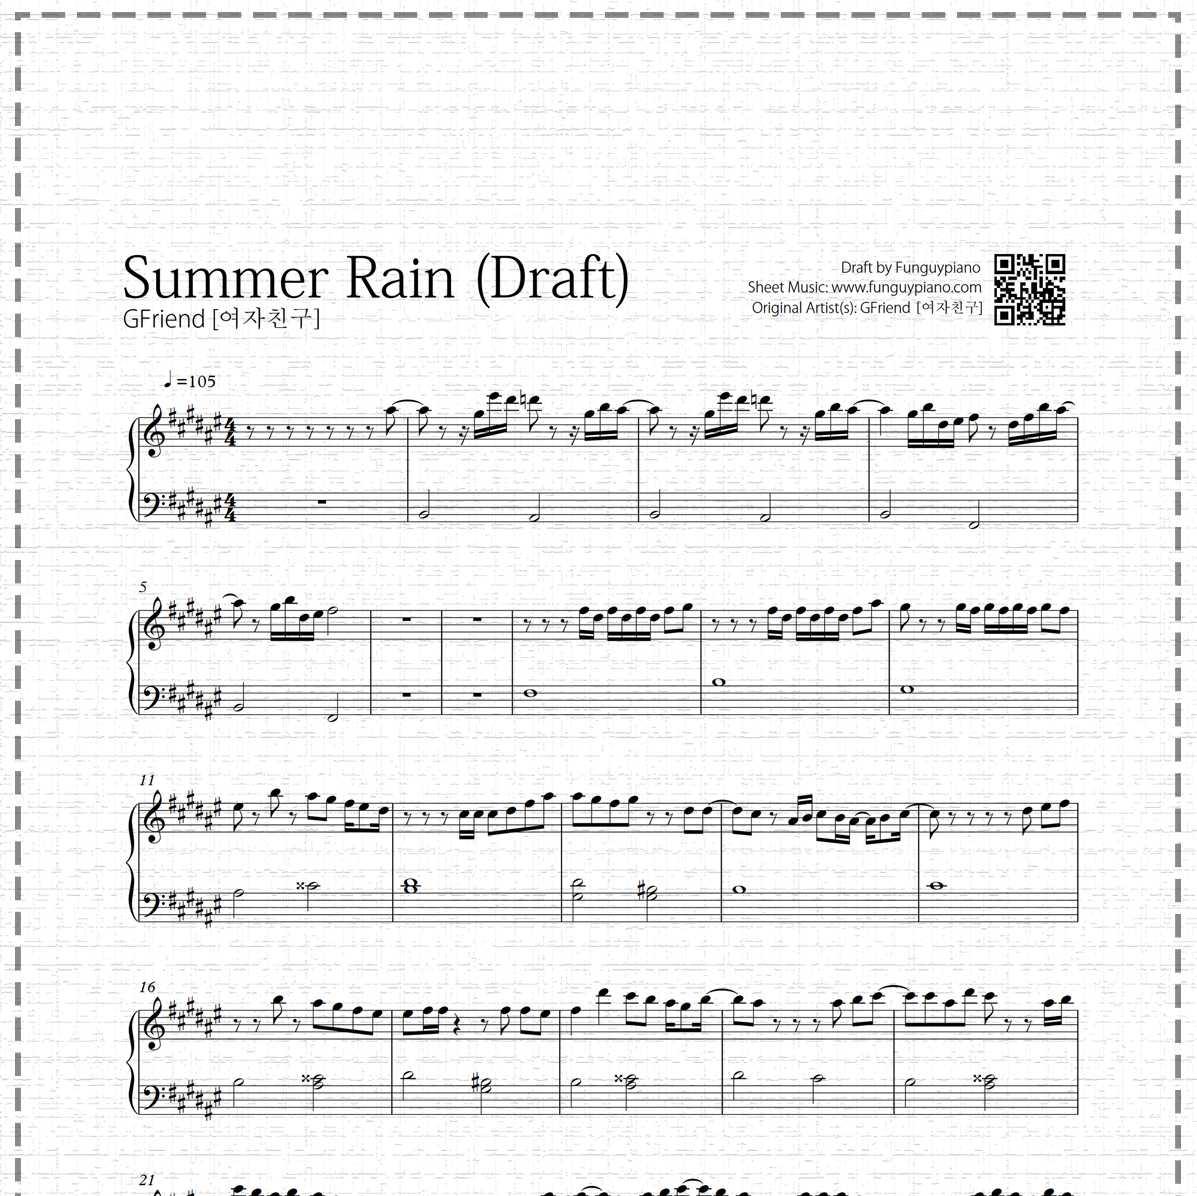 Gfriend - Summer Rain (Draft)